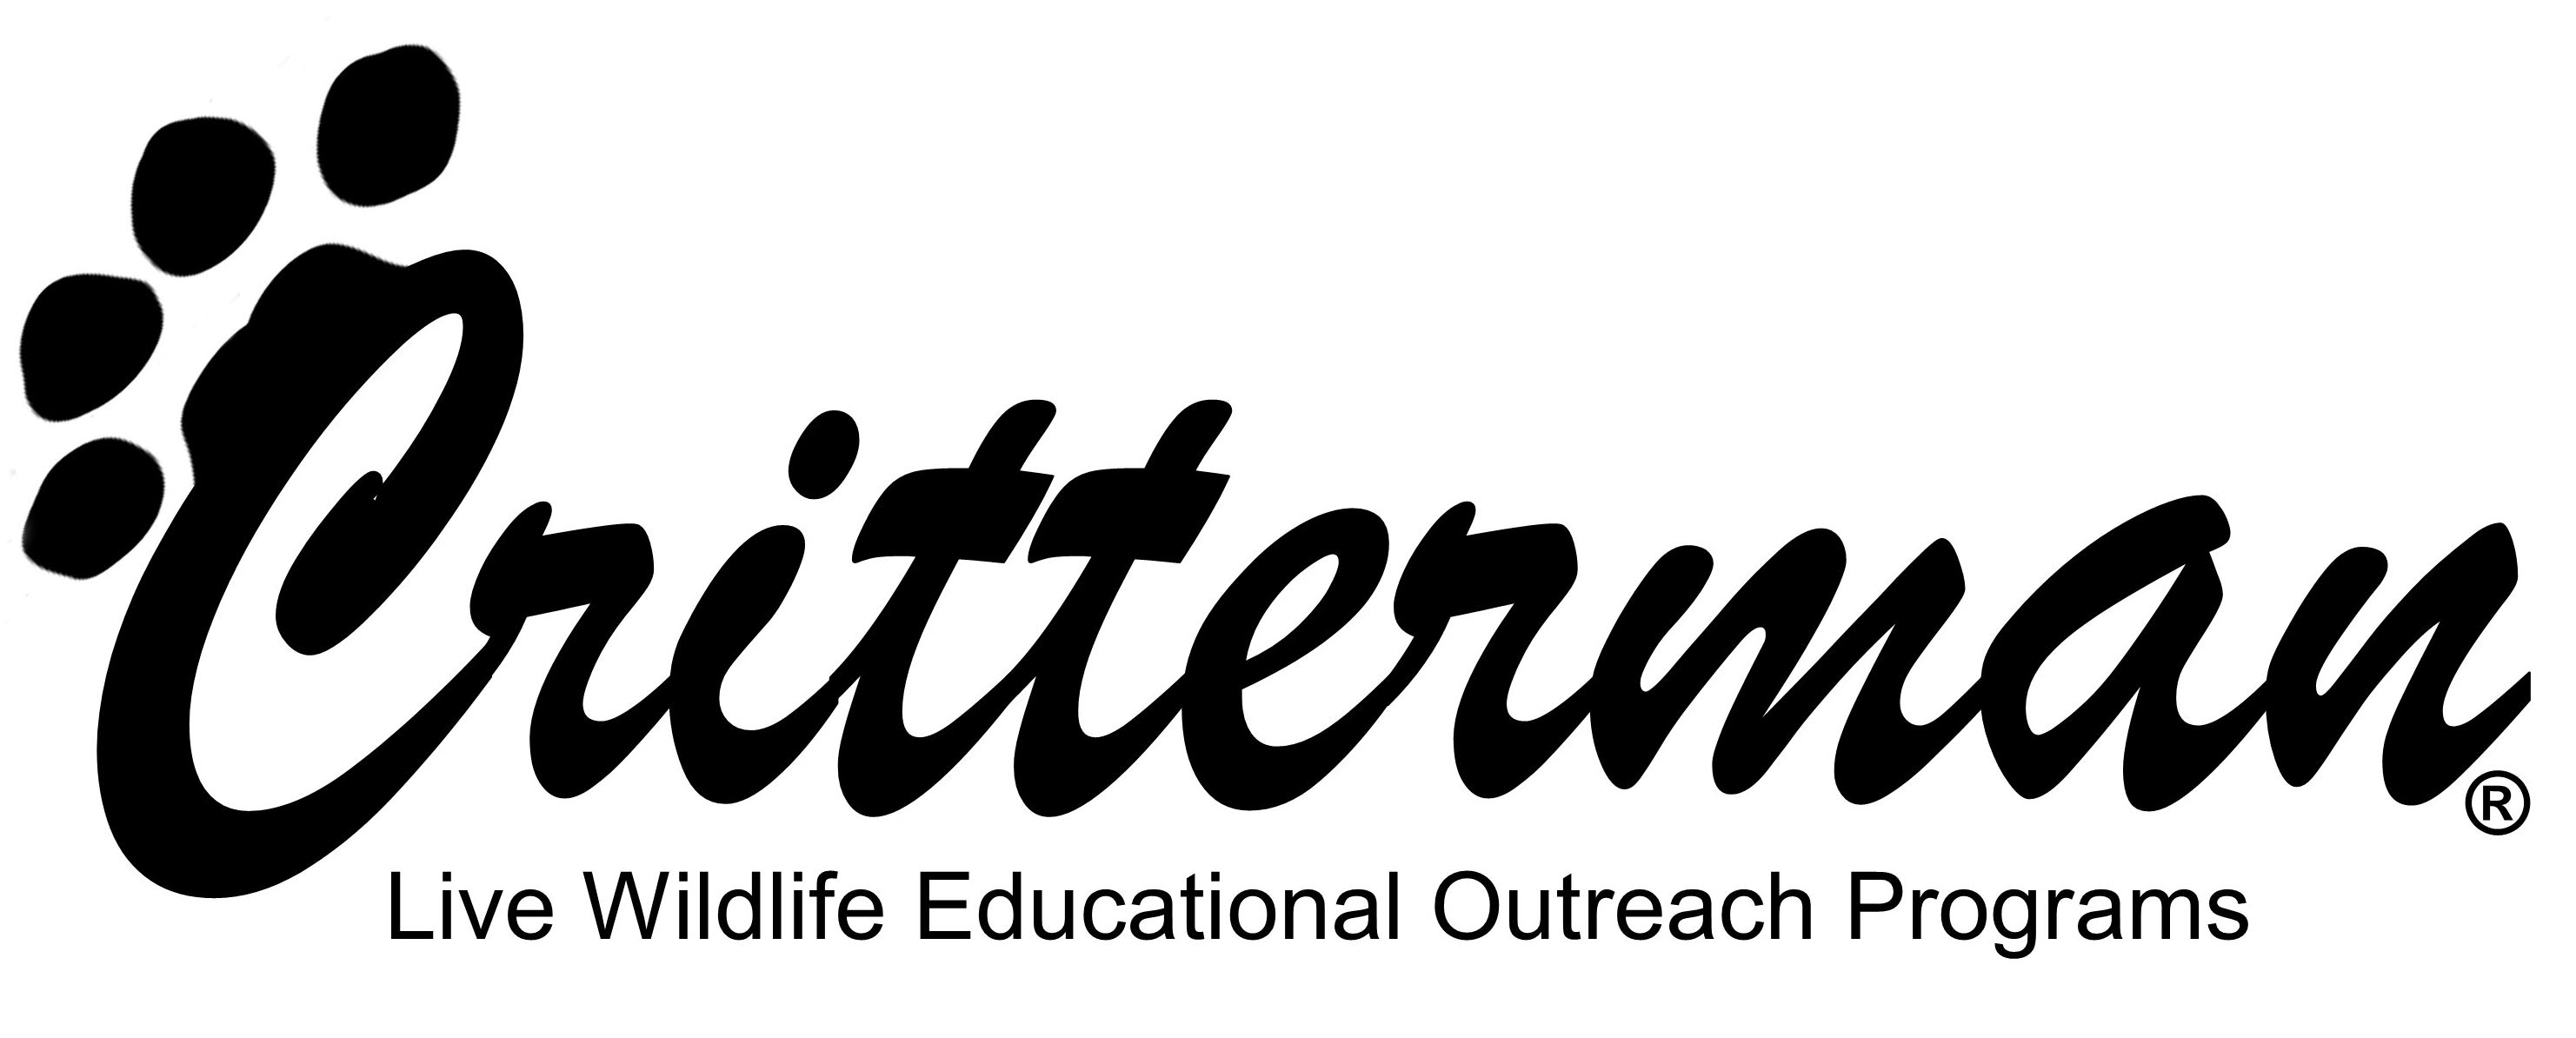 Critterman logo